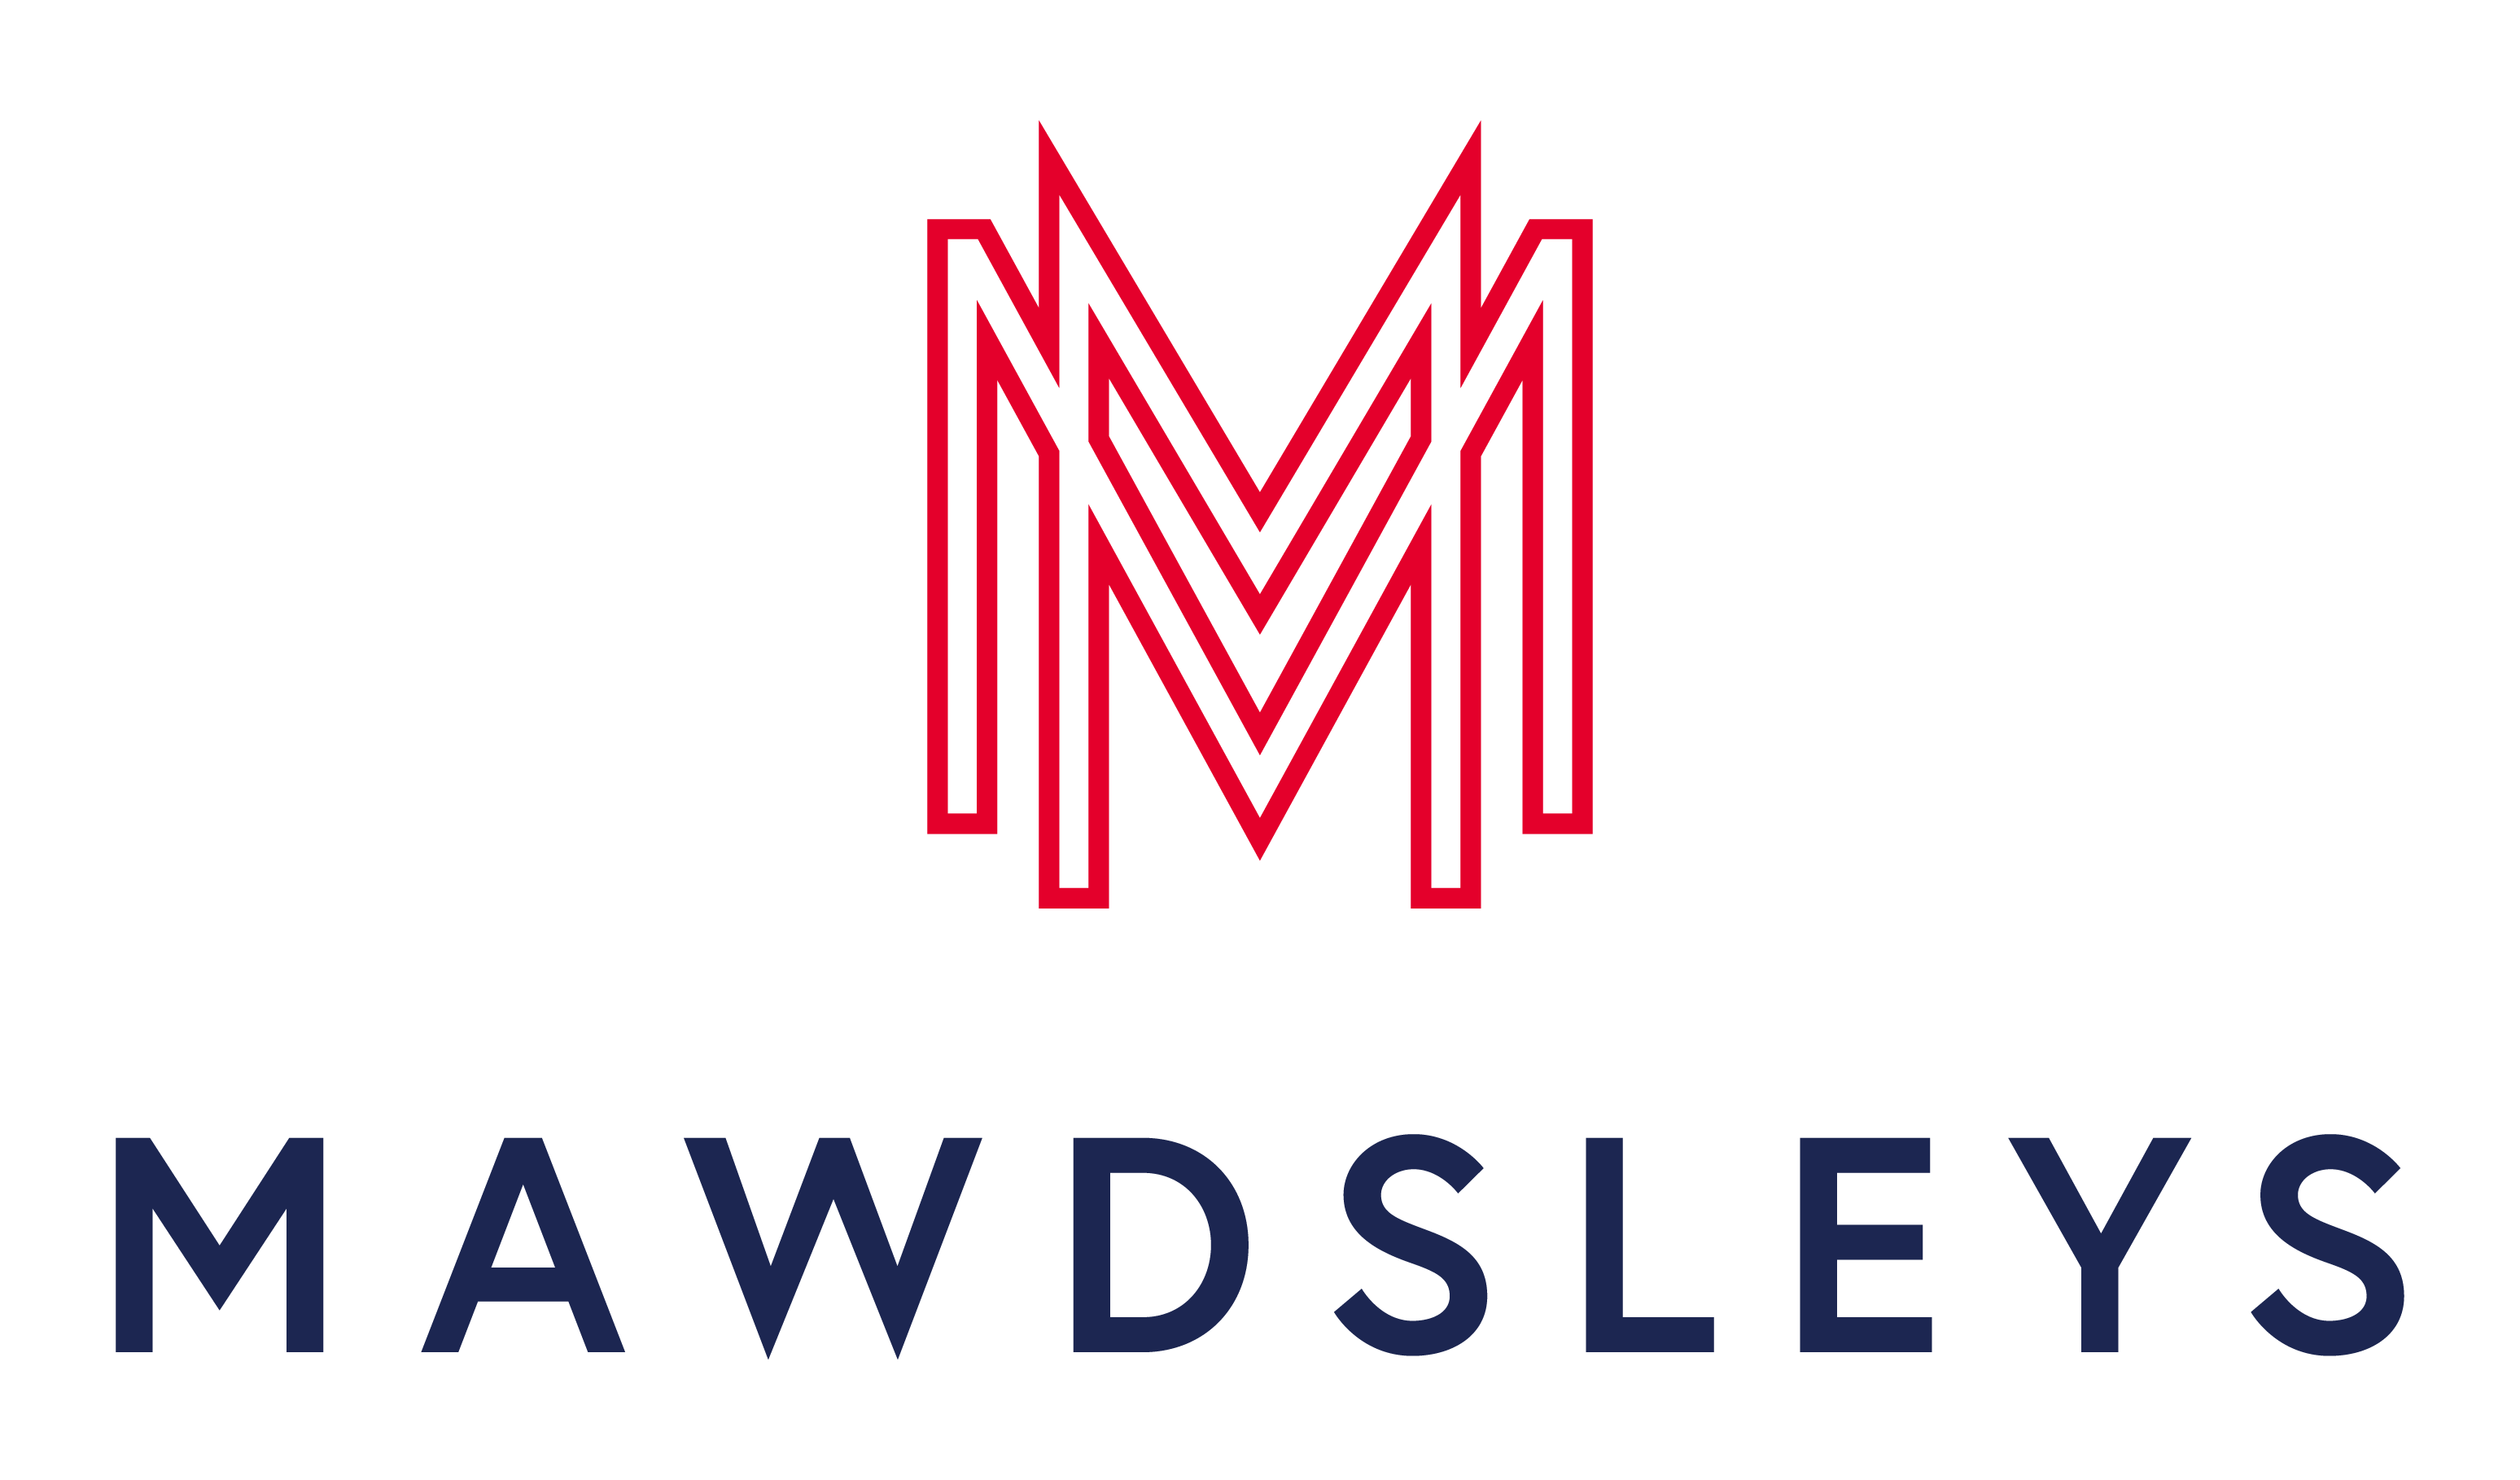 mawdslseys logo